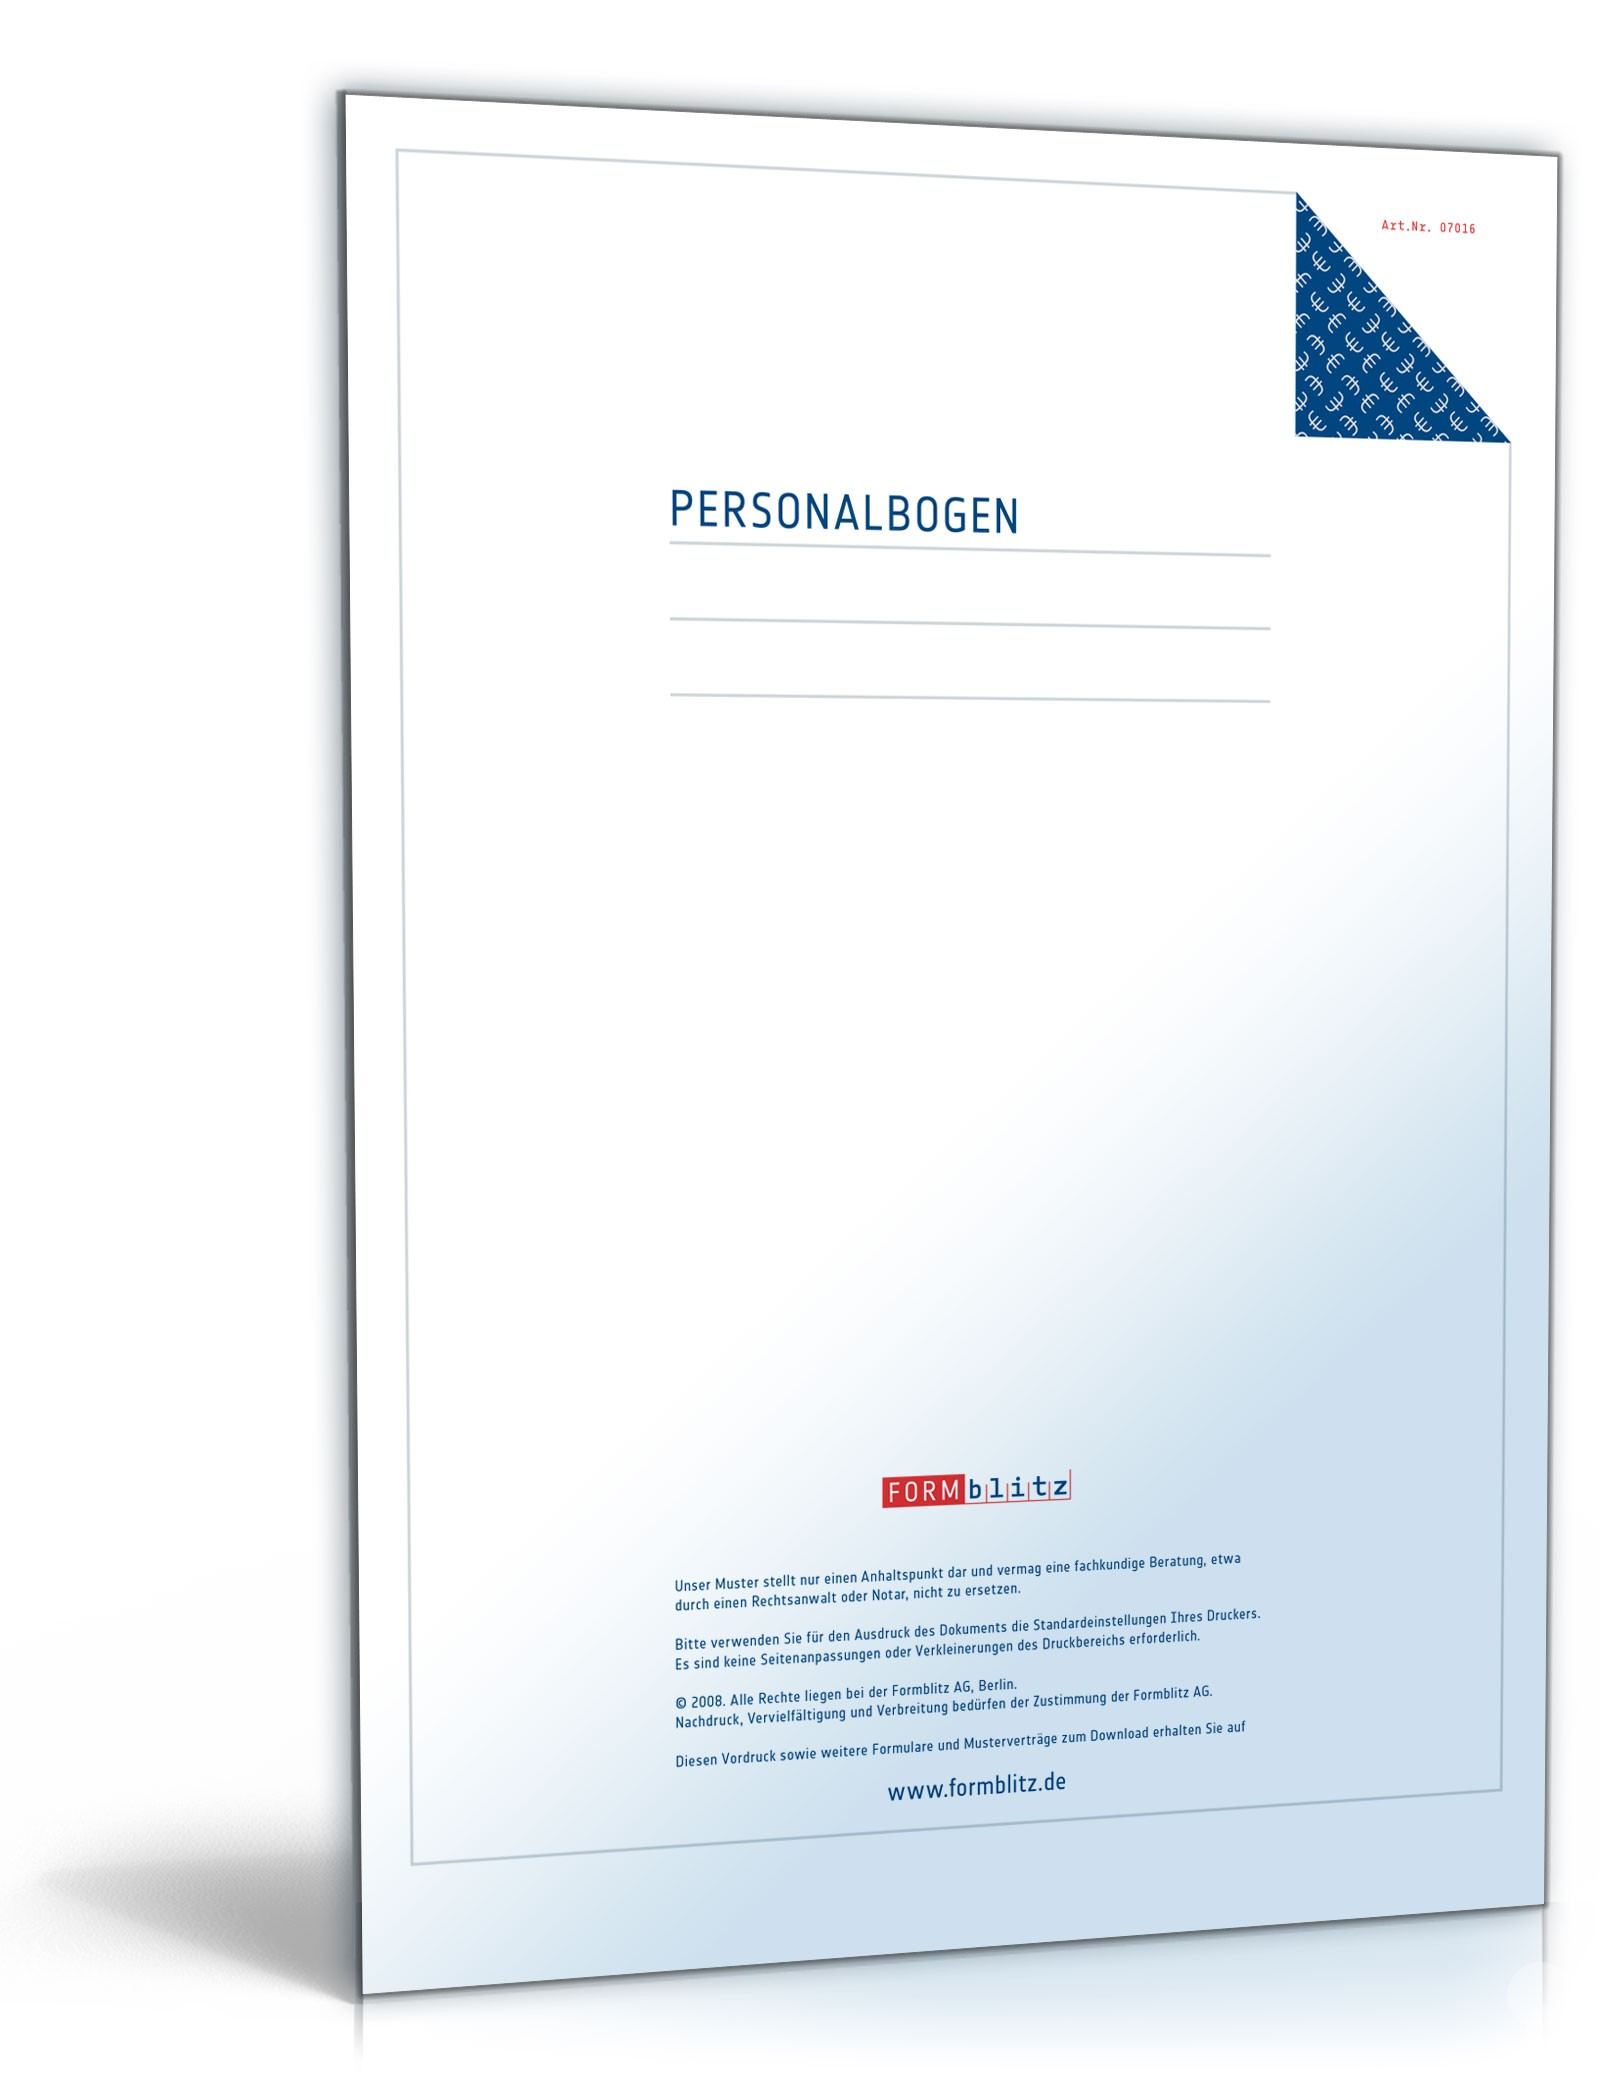 personalbogen formular zum download - Personalbogen Muster